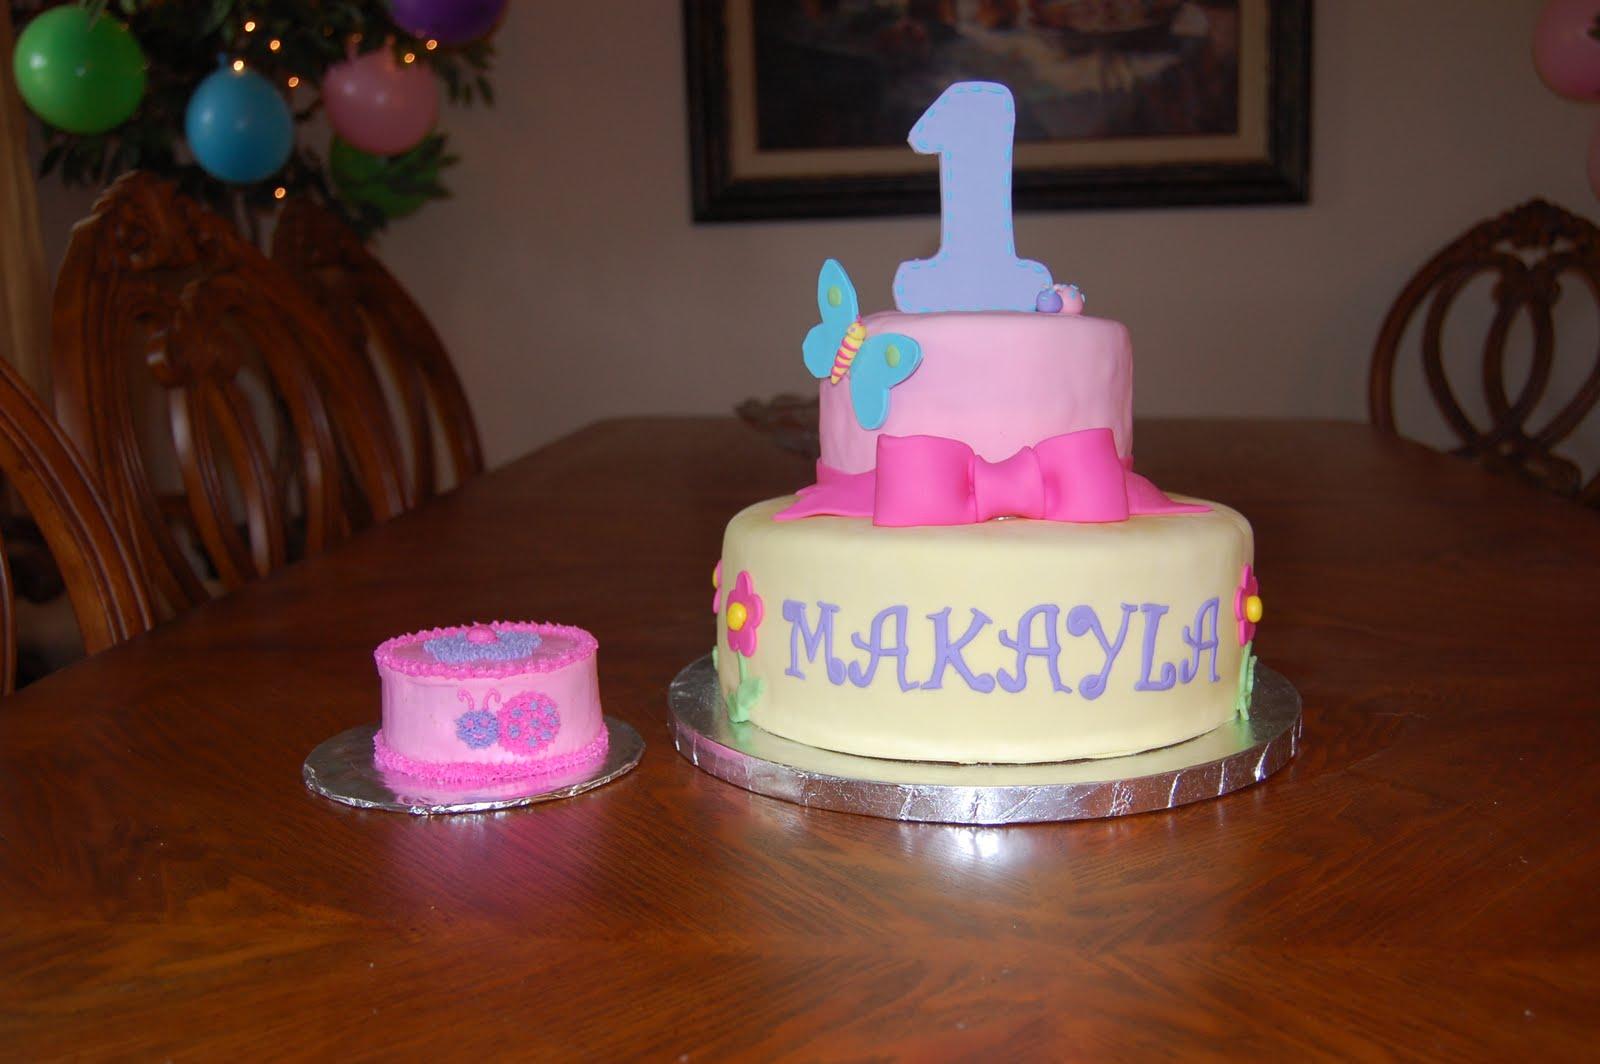 Cake 1 4 4 Inch Tier 4 Inch Inch 10 Sizes Inch 6